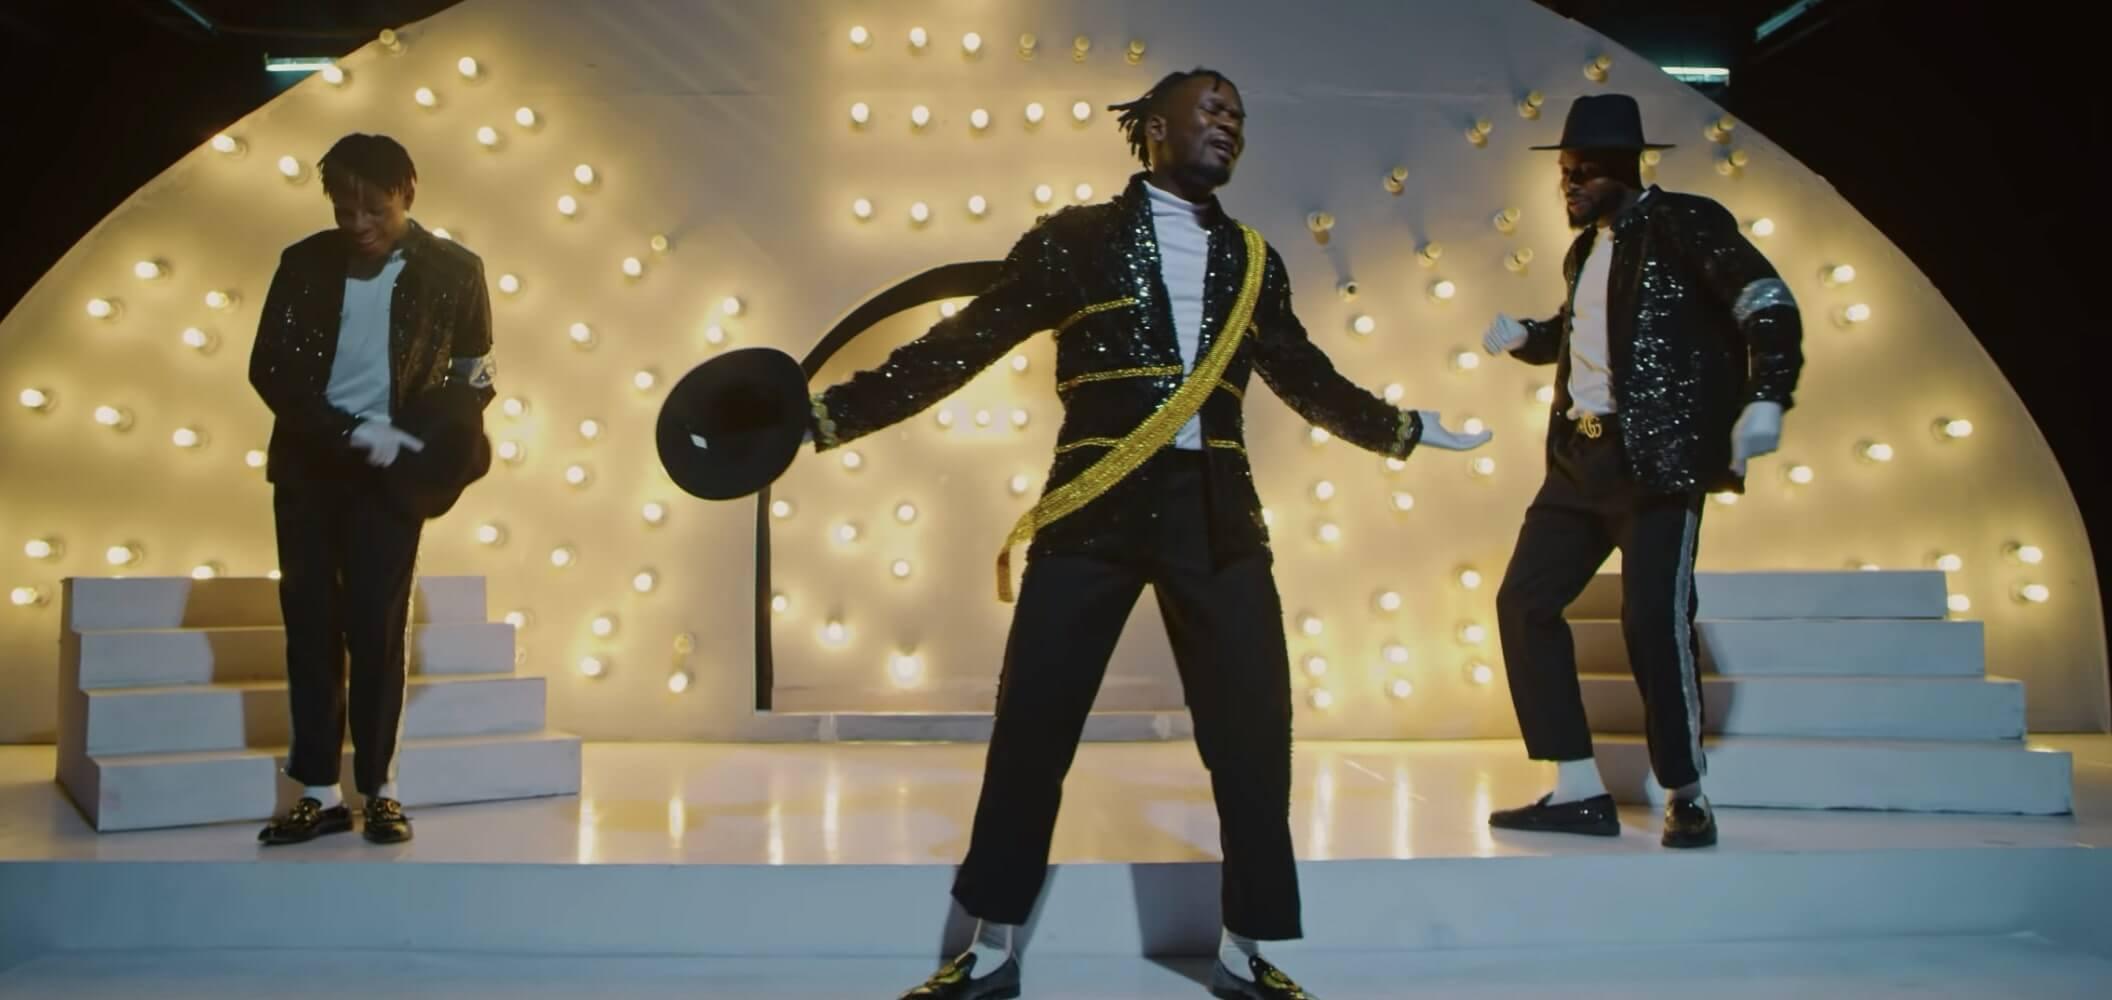 Top Naija Songs of the Week: Davido - Wande Coal - Mayorkun - Falz - M.I